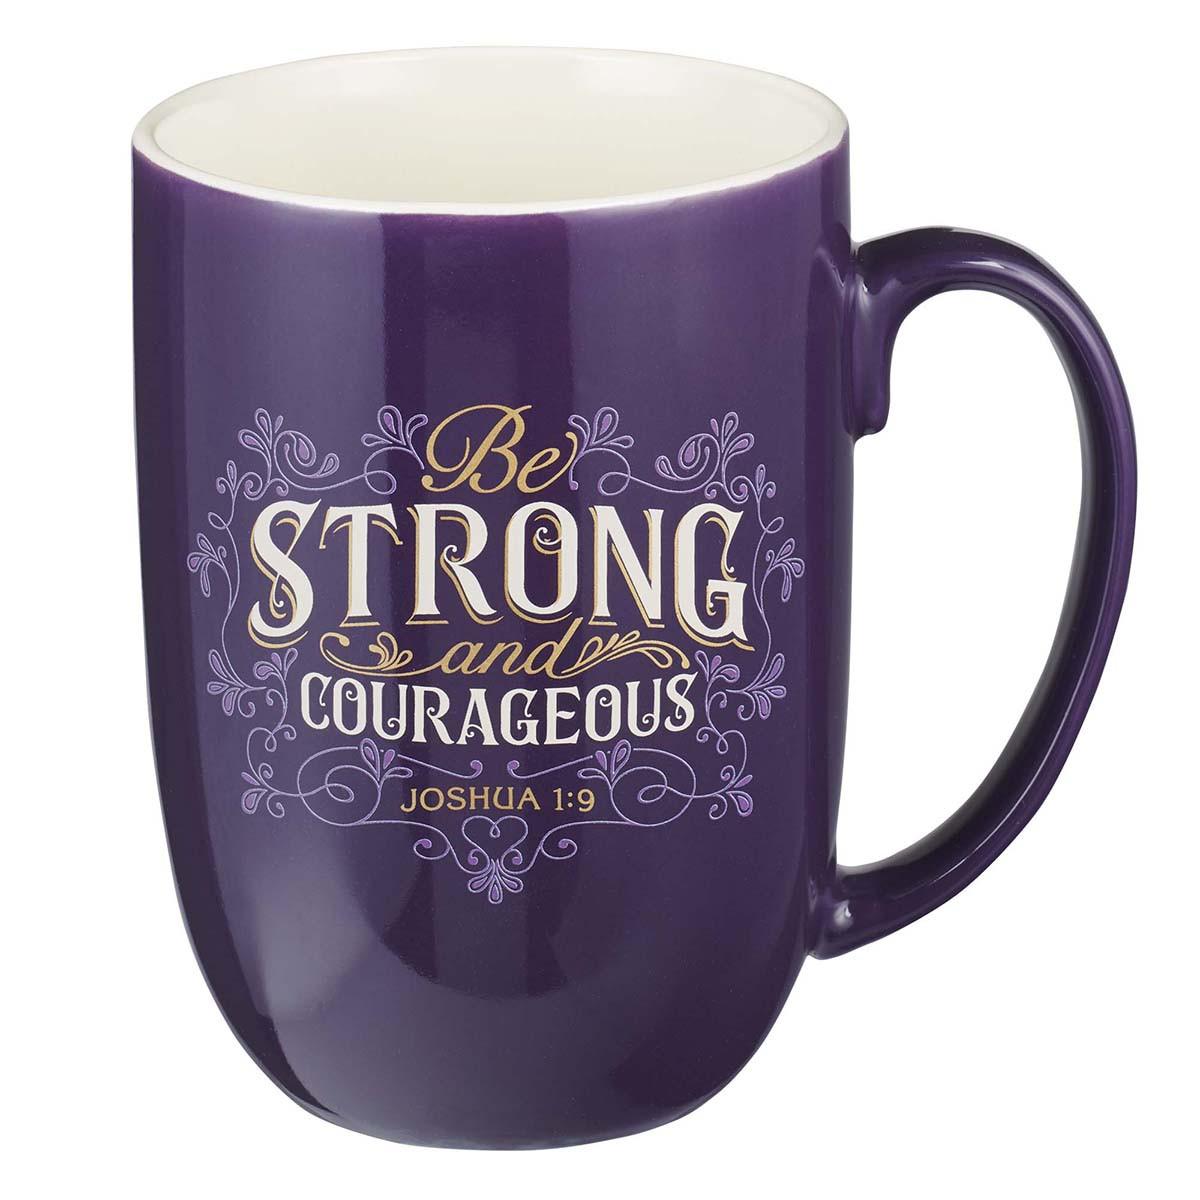 Joshua 1:9 Be Strong And Courageous (Ceramic Mug)